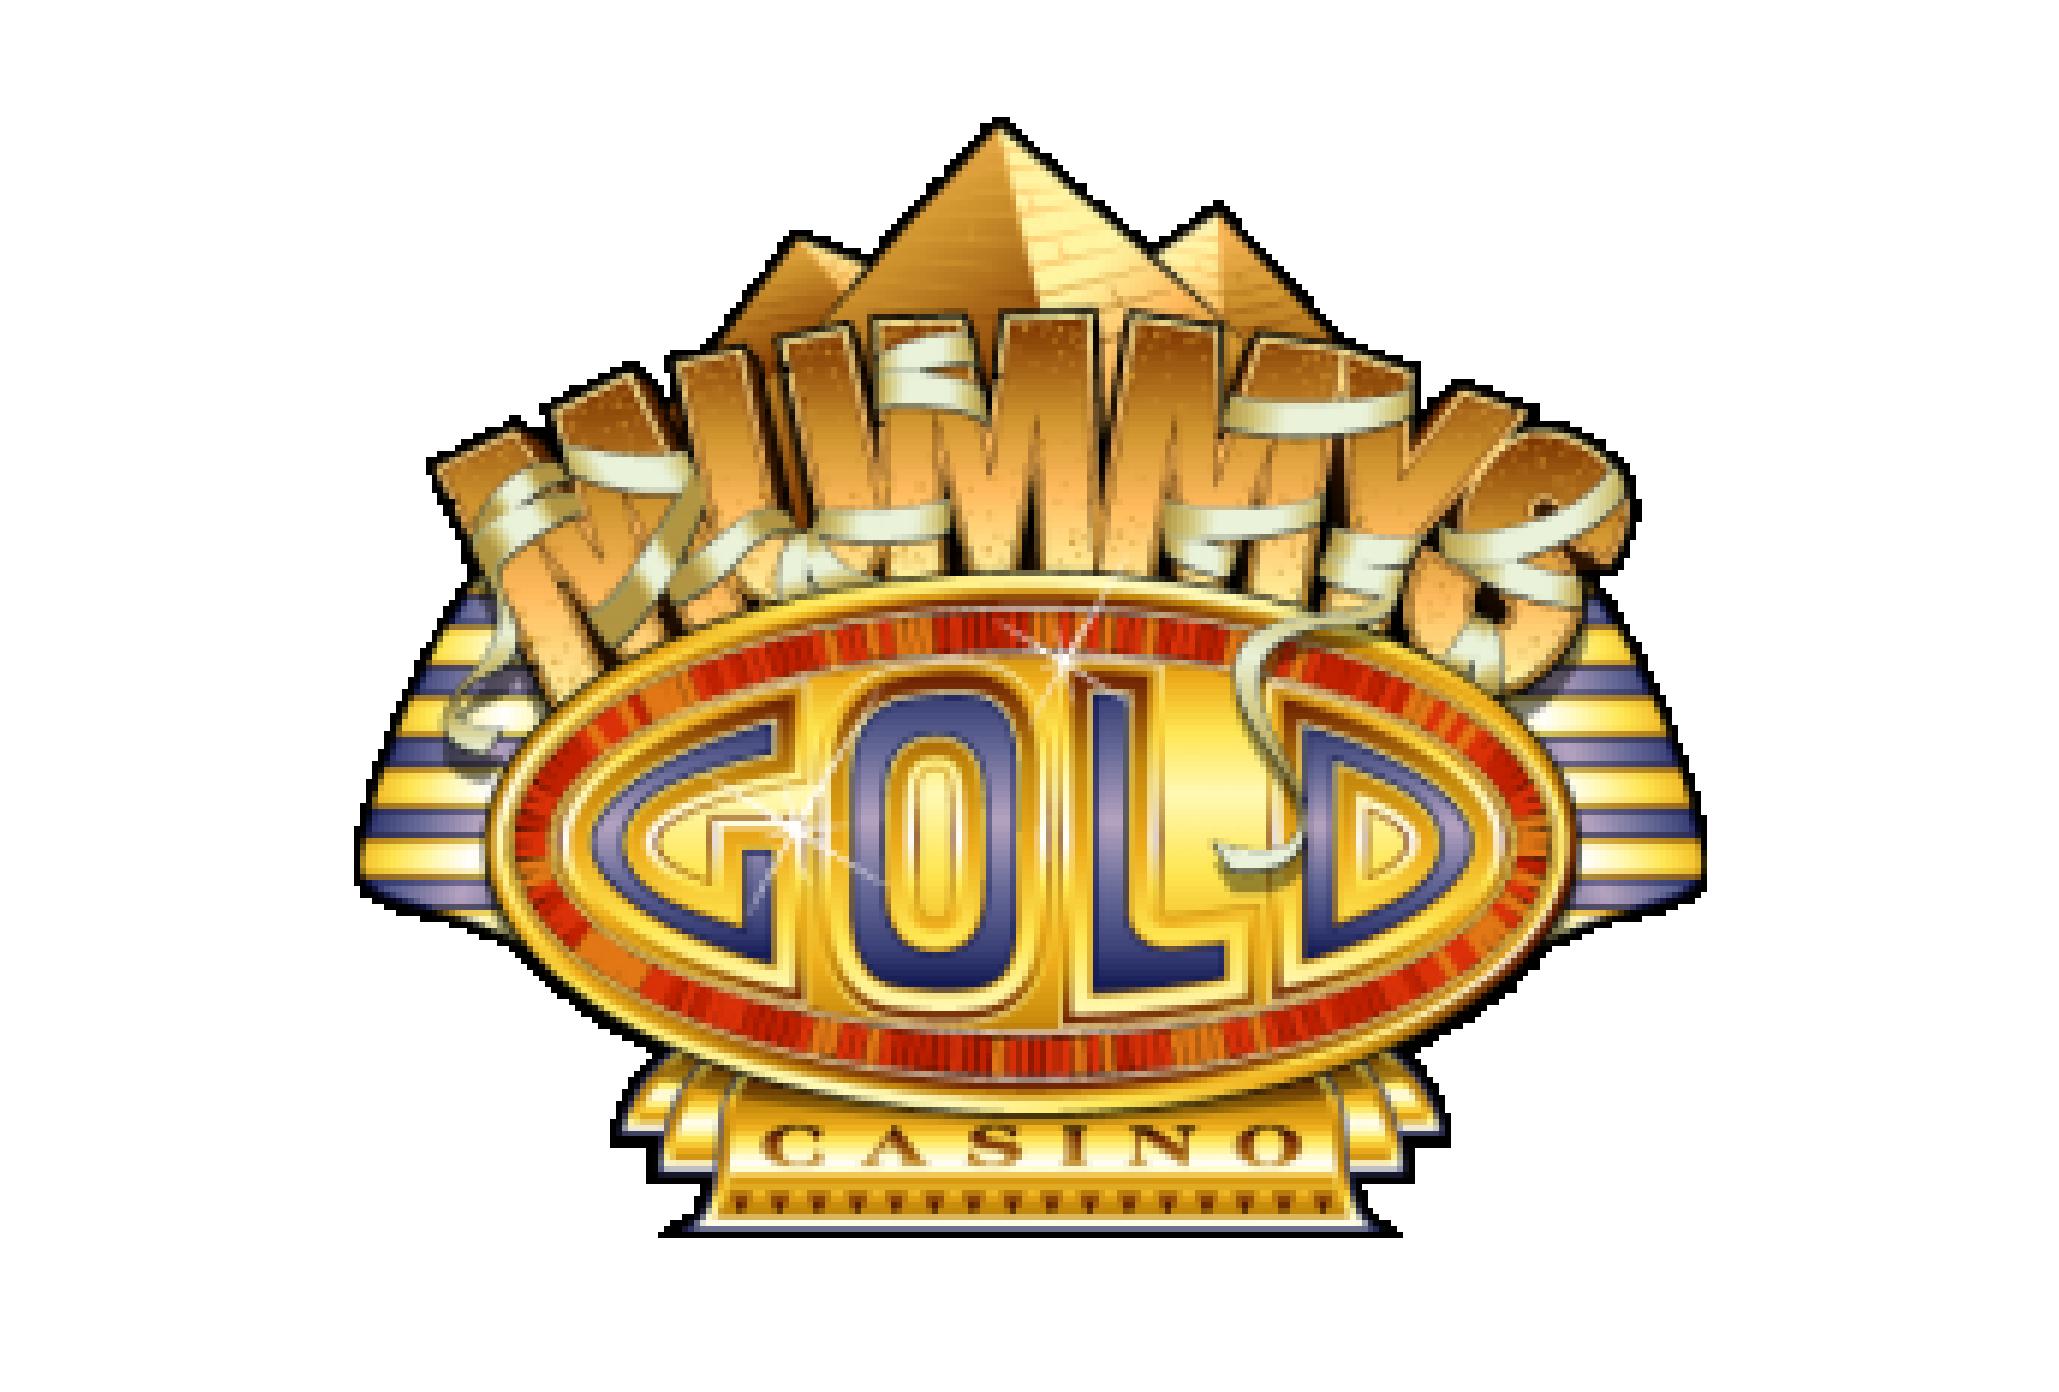 mummys gold casino - logo-01